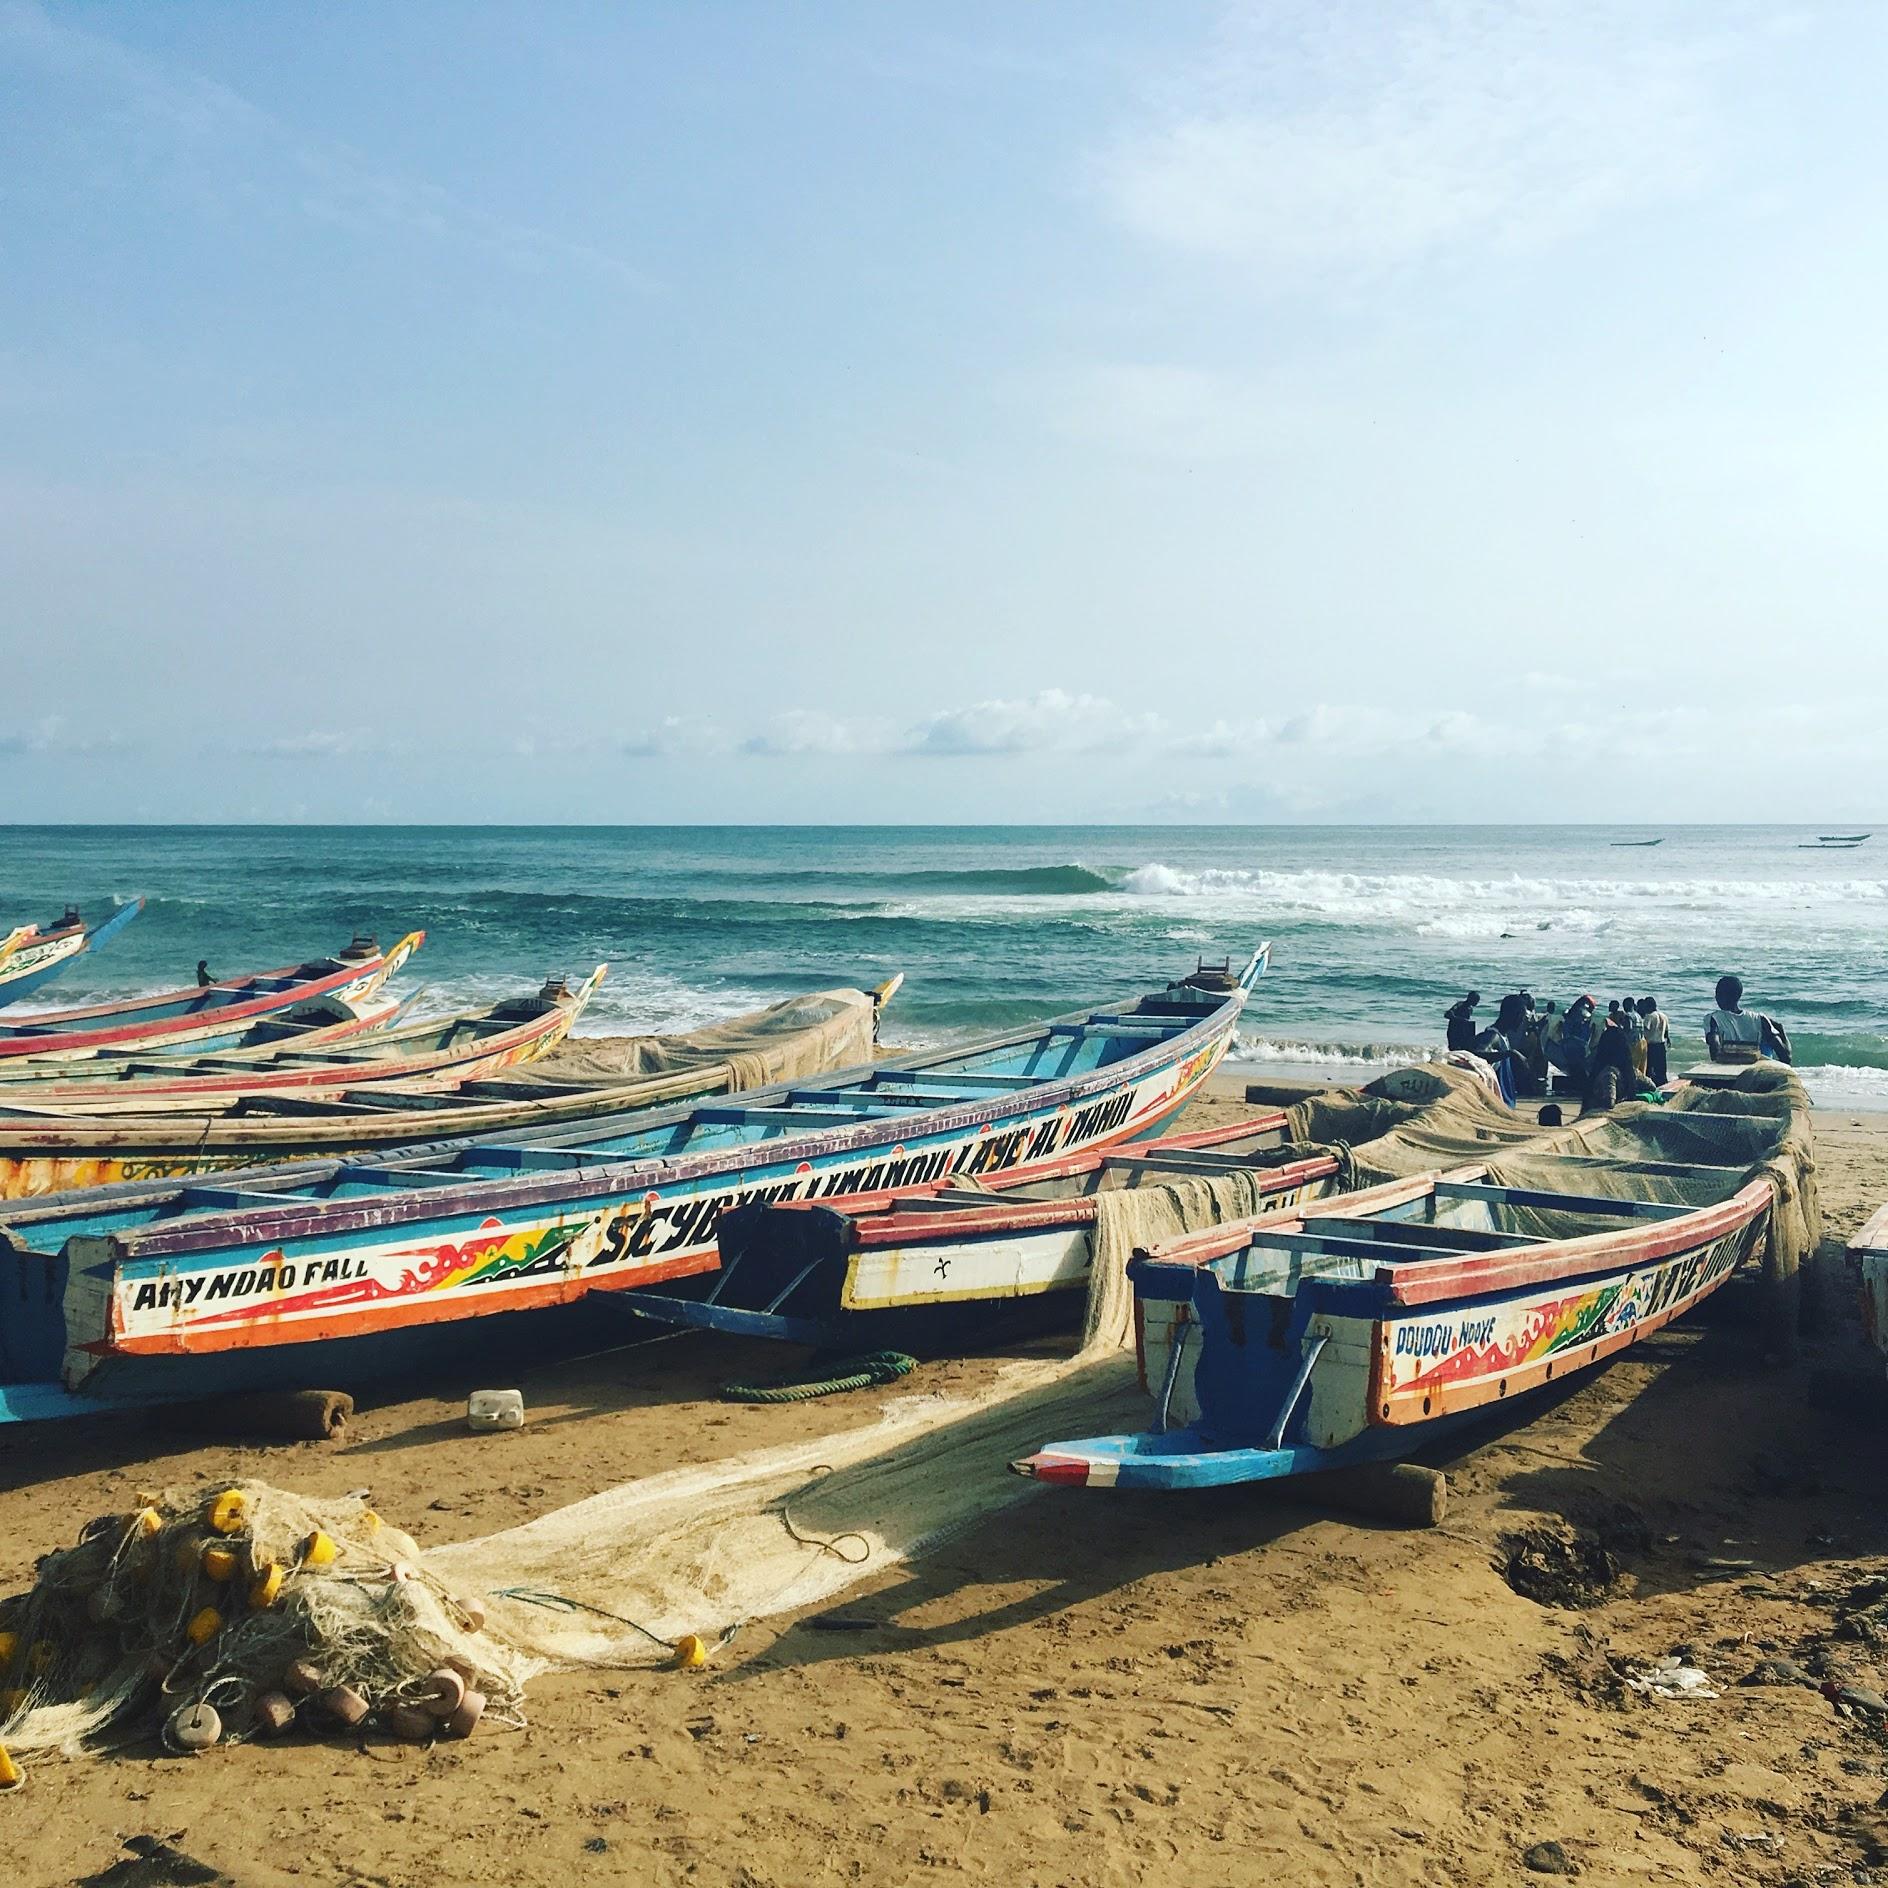 Fishing boats in Dakar, Sénégal